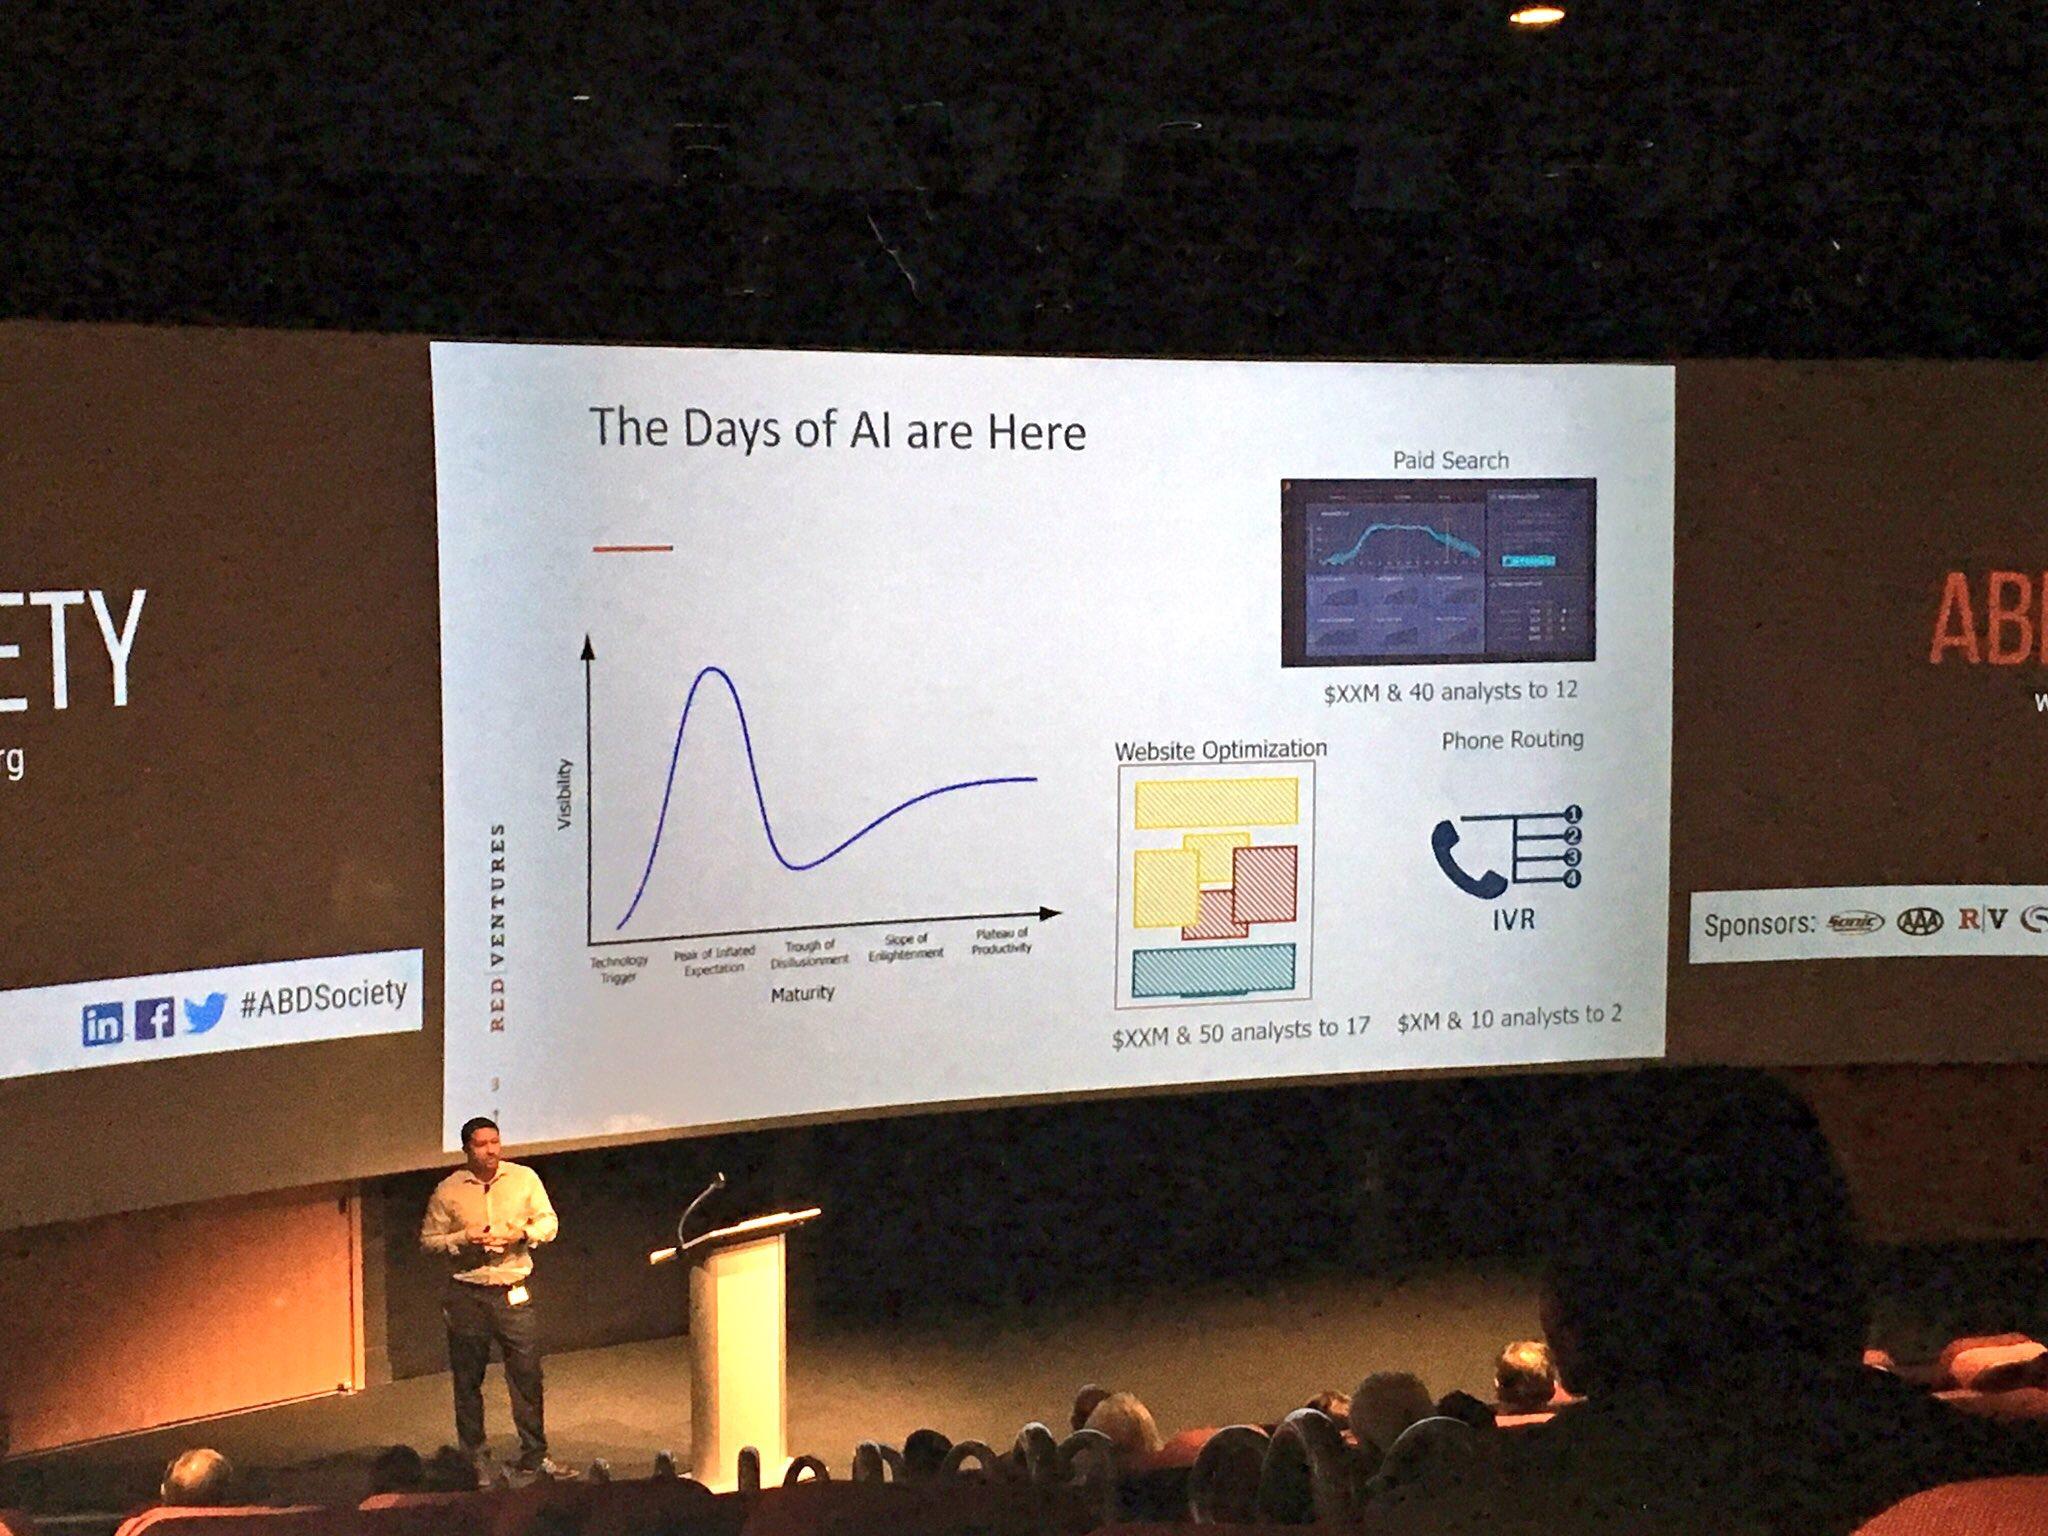 John Thomas - EVP Data Science at Red Ventures